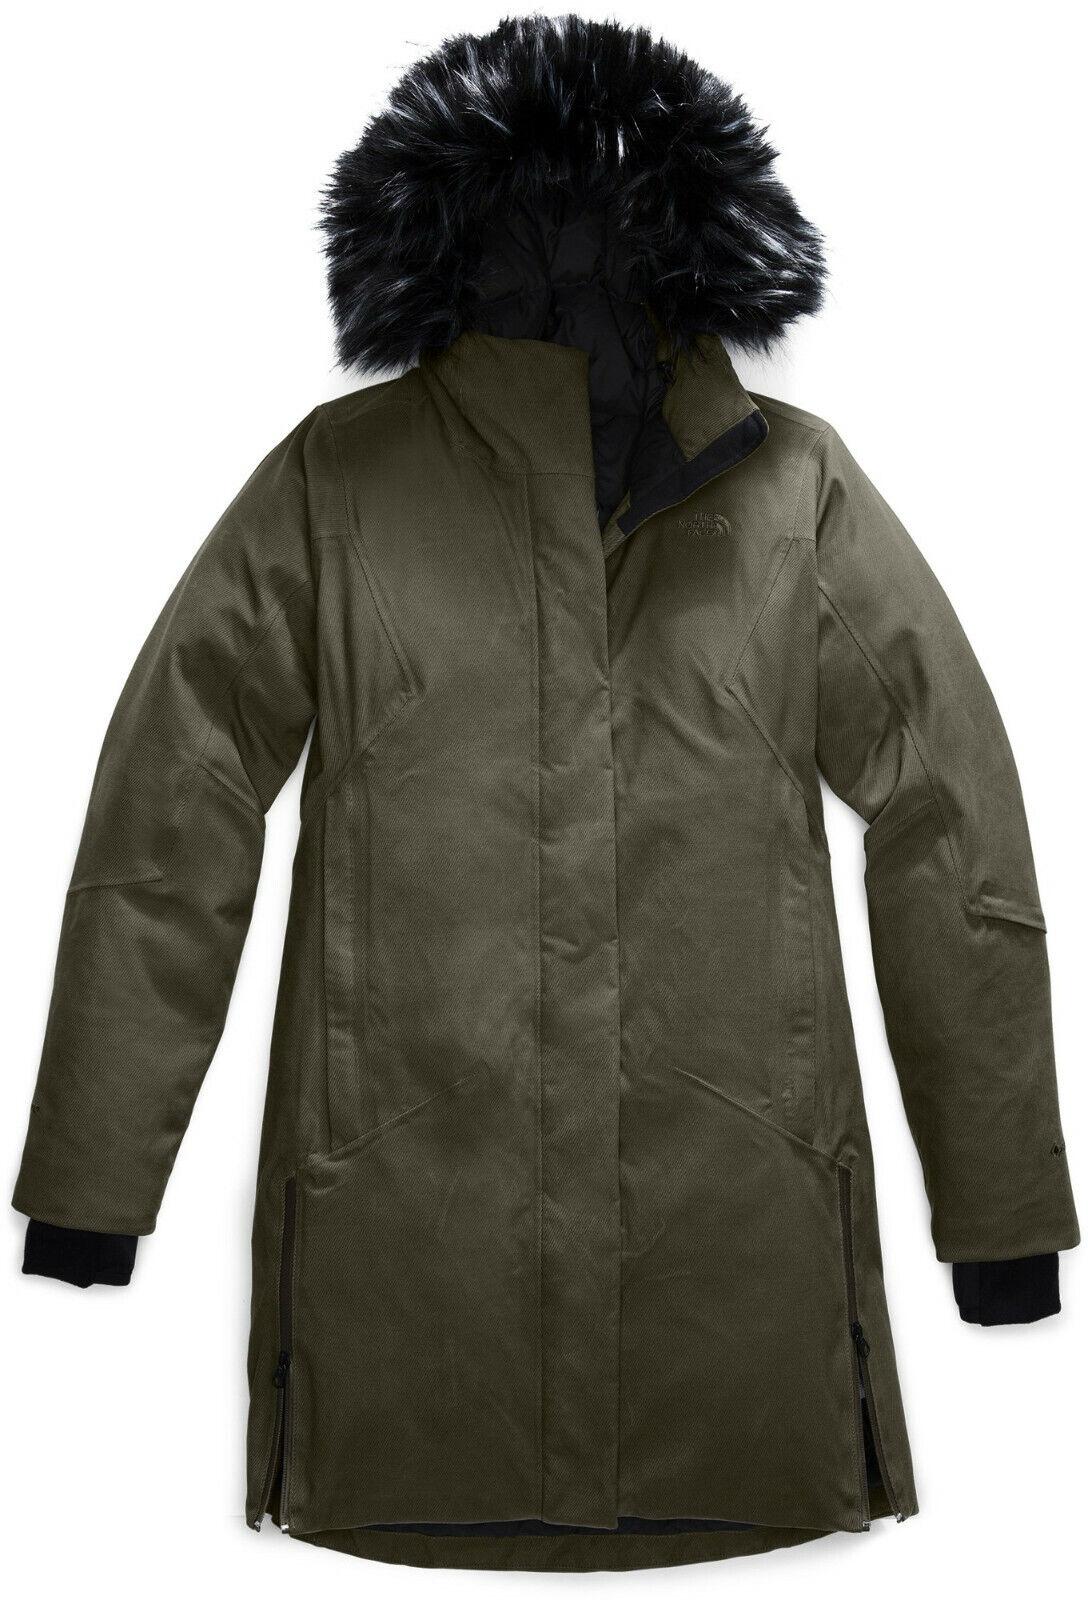 womens-the-north-face-defdown-550-down-gore-tex-parka-gtx-jacket-m-new-450